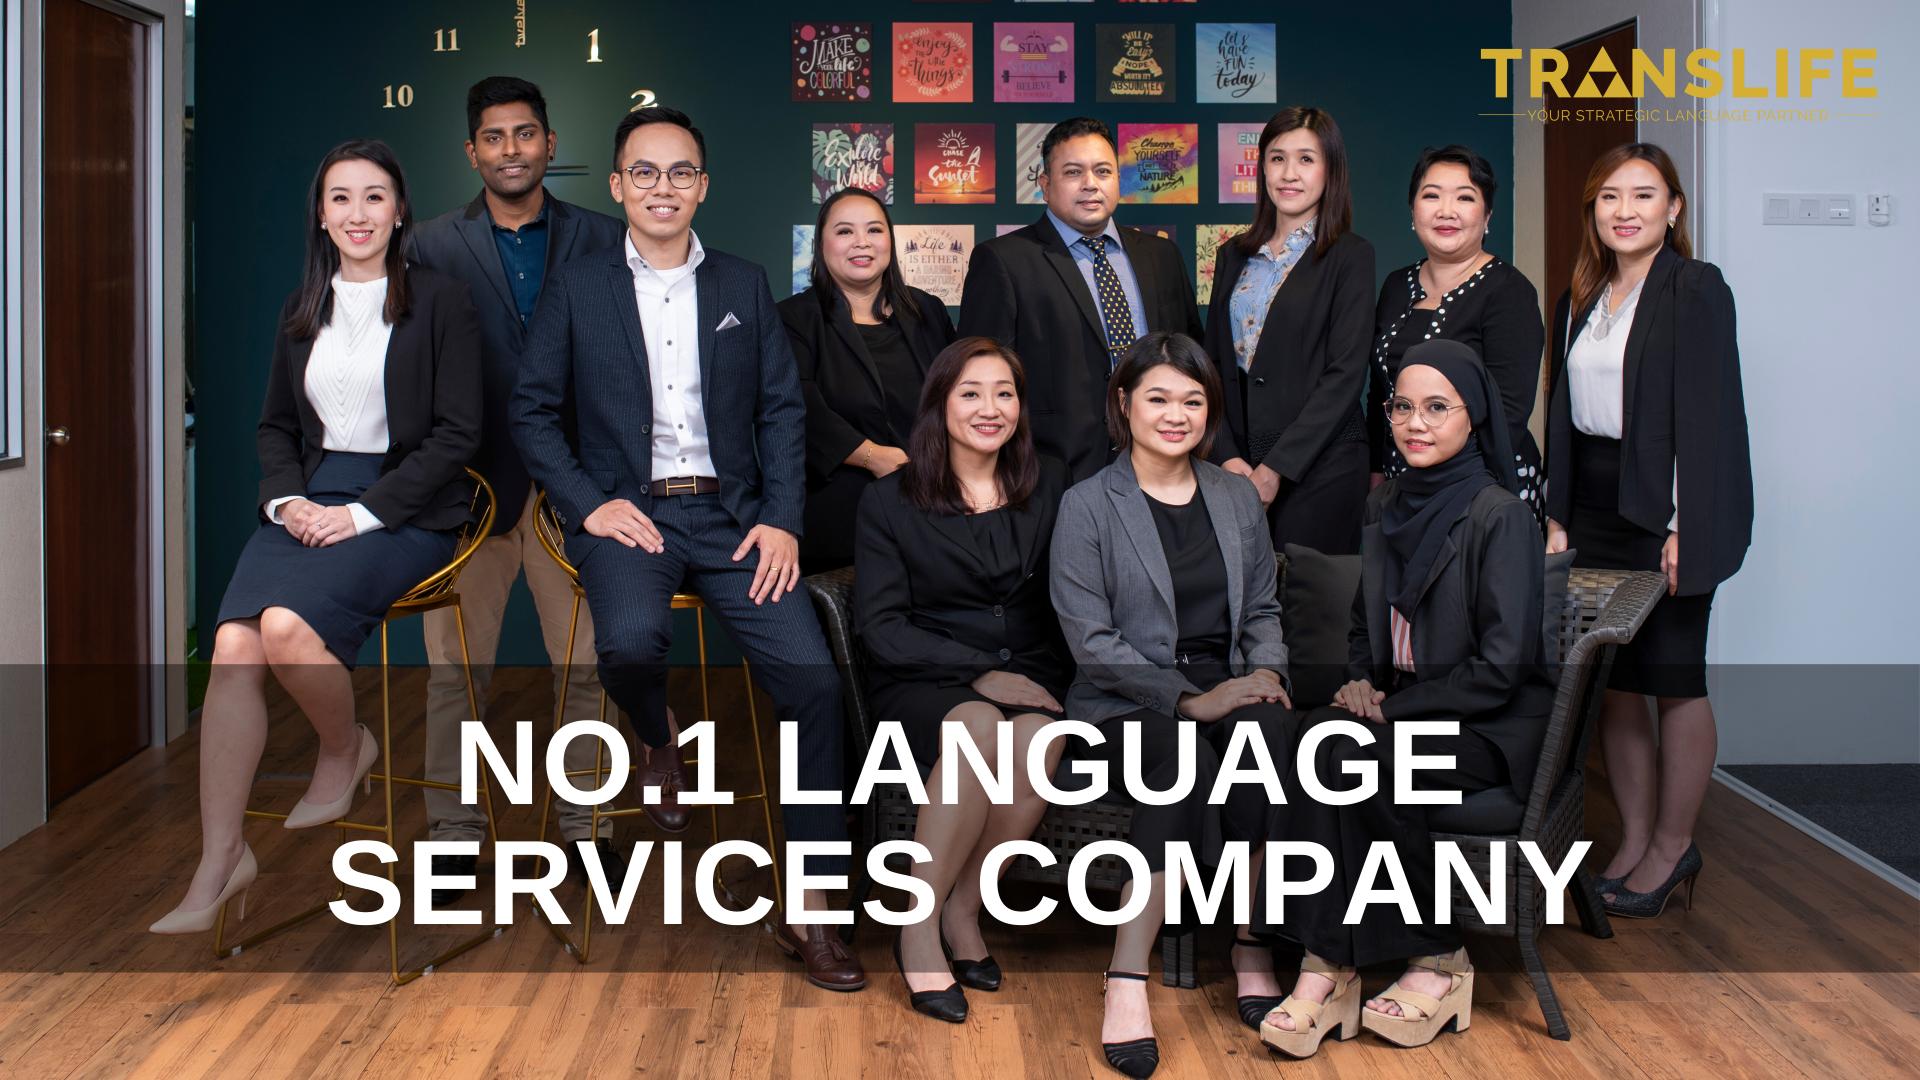 Proofreading service malaysia